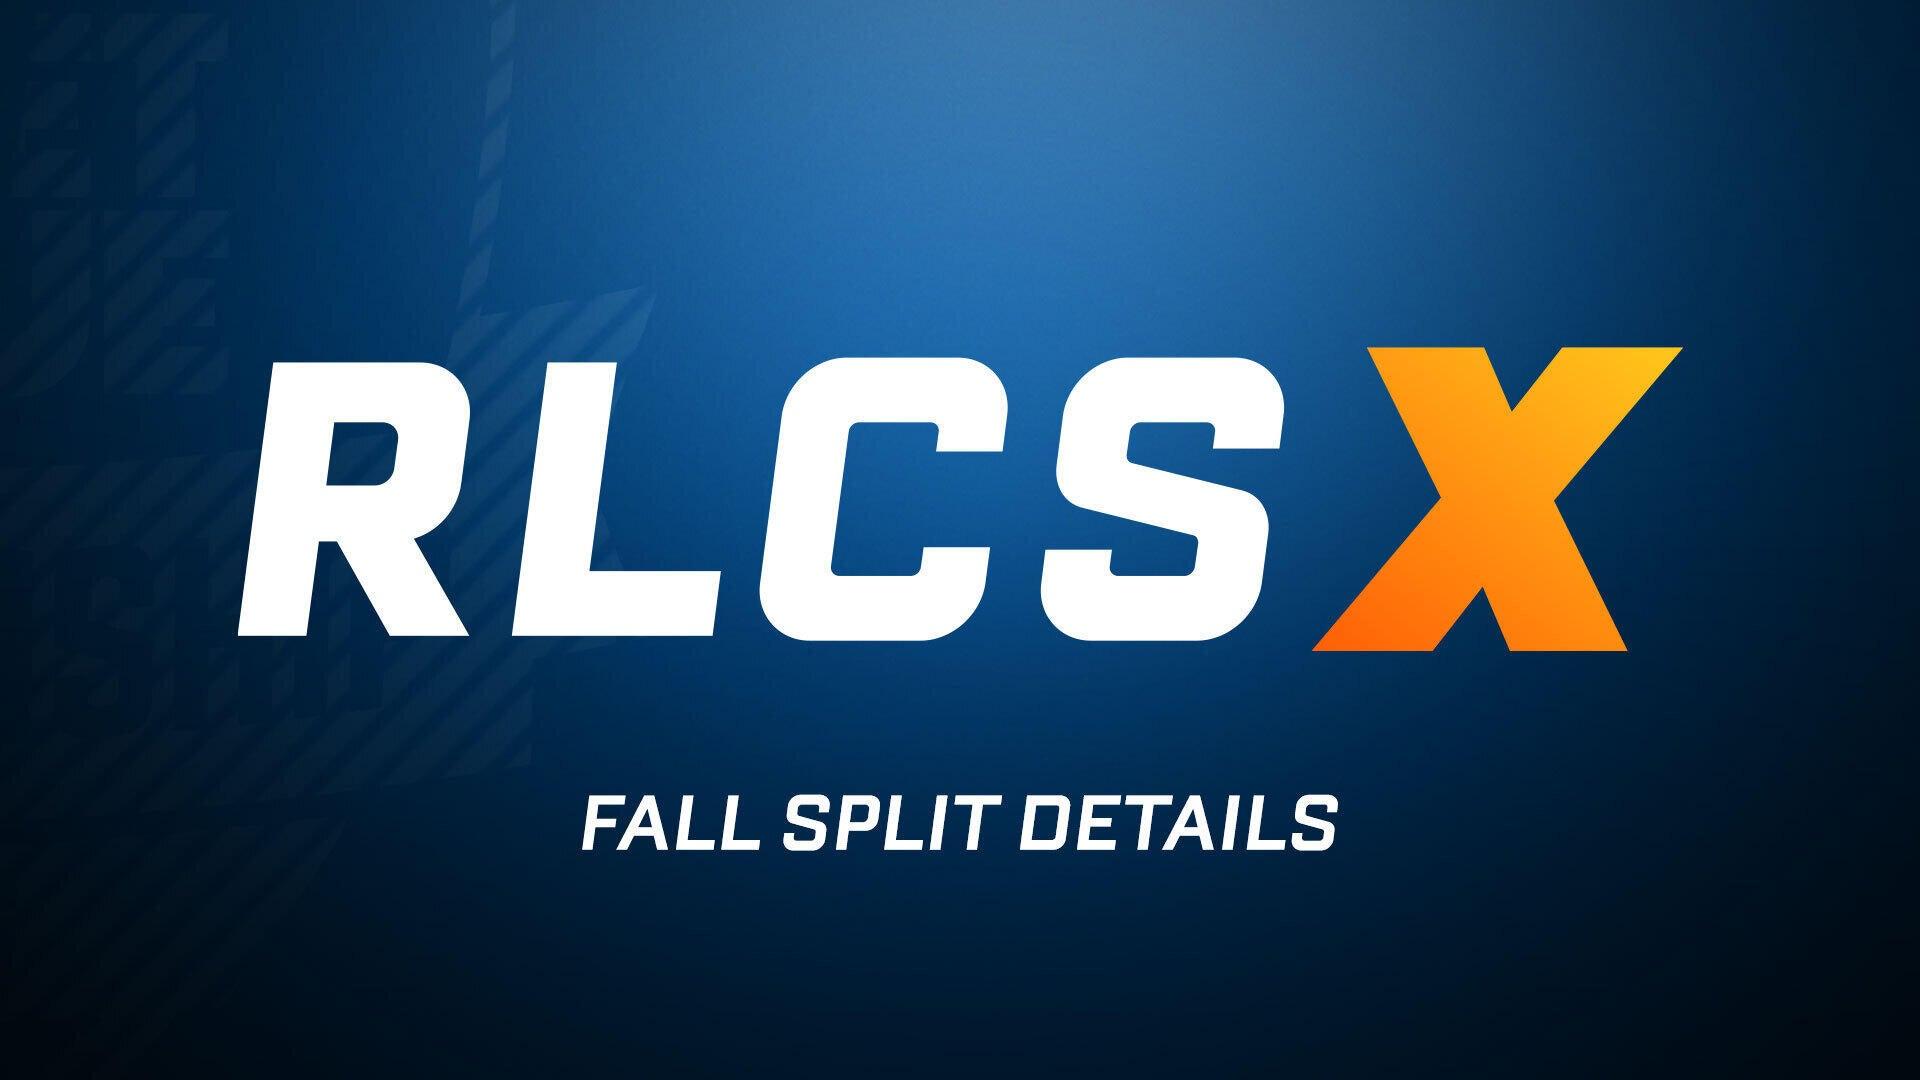 RLCS X: Fall Split Details Image